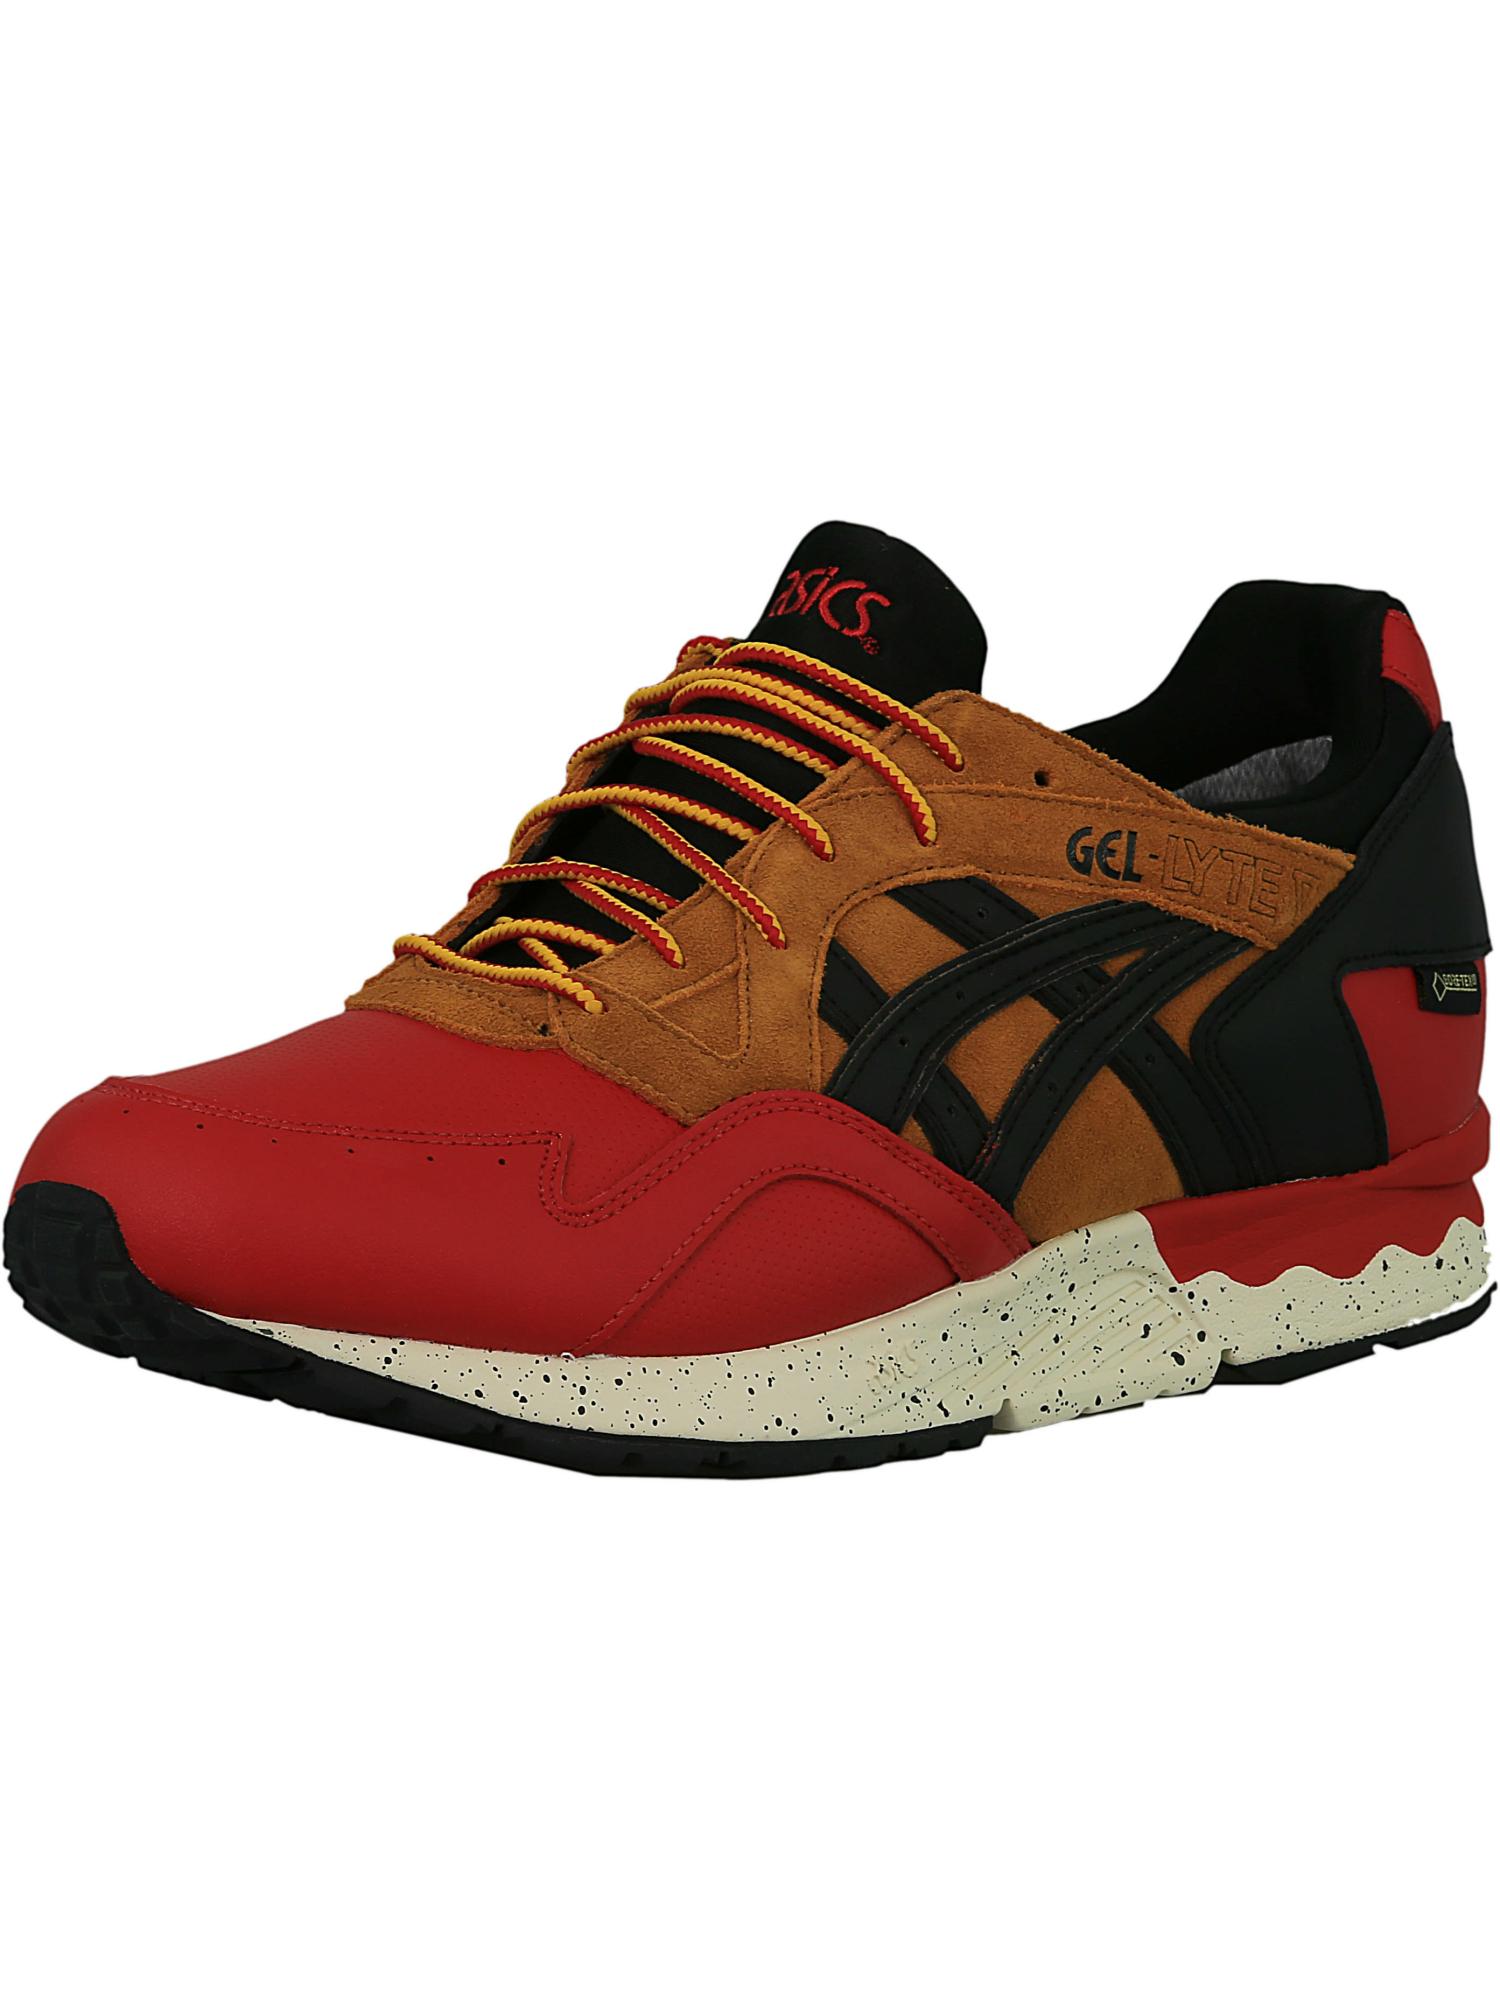 Mens Gel-Lyte V G-TX Red/Black Ankle-High Leather Running Shoe - 11M Asics Günstig Kaufen 2018 Neue 0cmQbuYBga